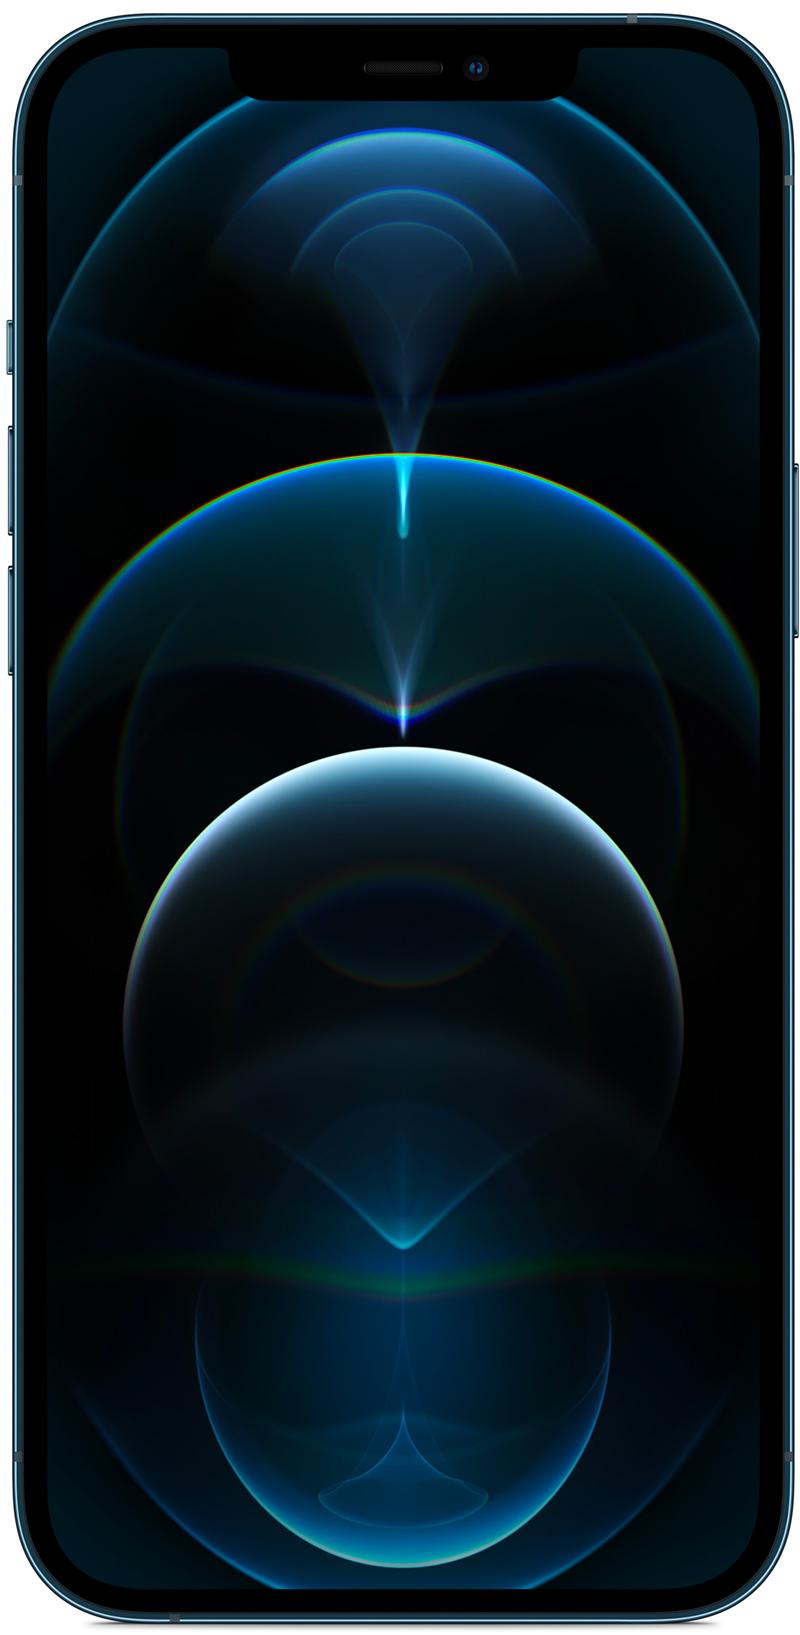 Apple iPhone 12 Pro Max bleu Pacifique 512Go